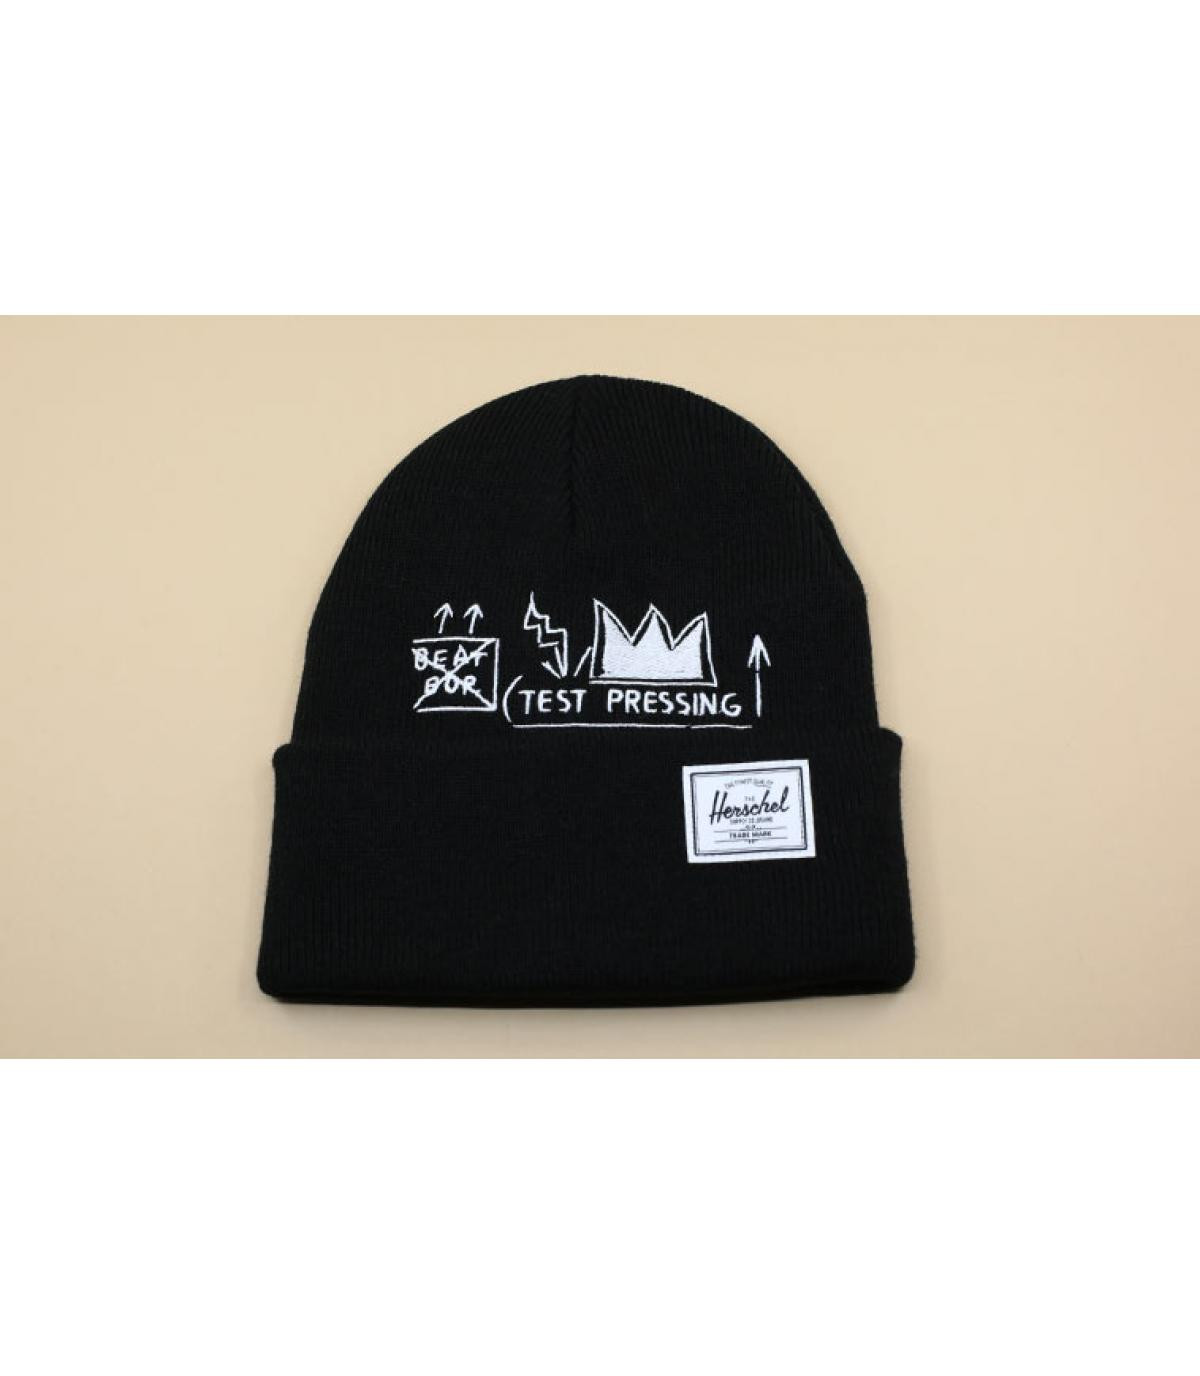 Basquiat hoed zwart Herschel